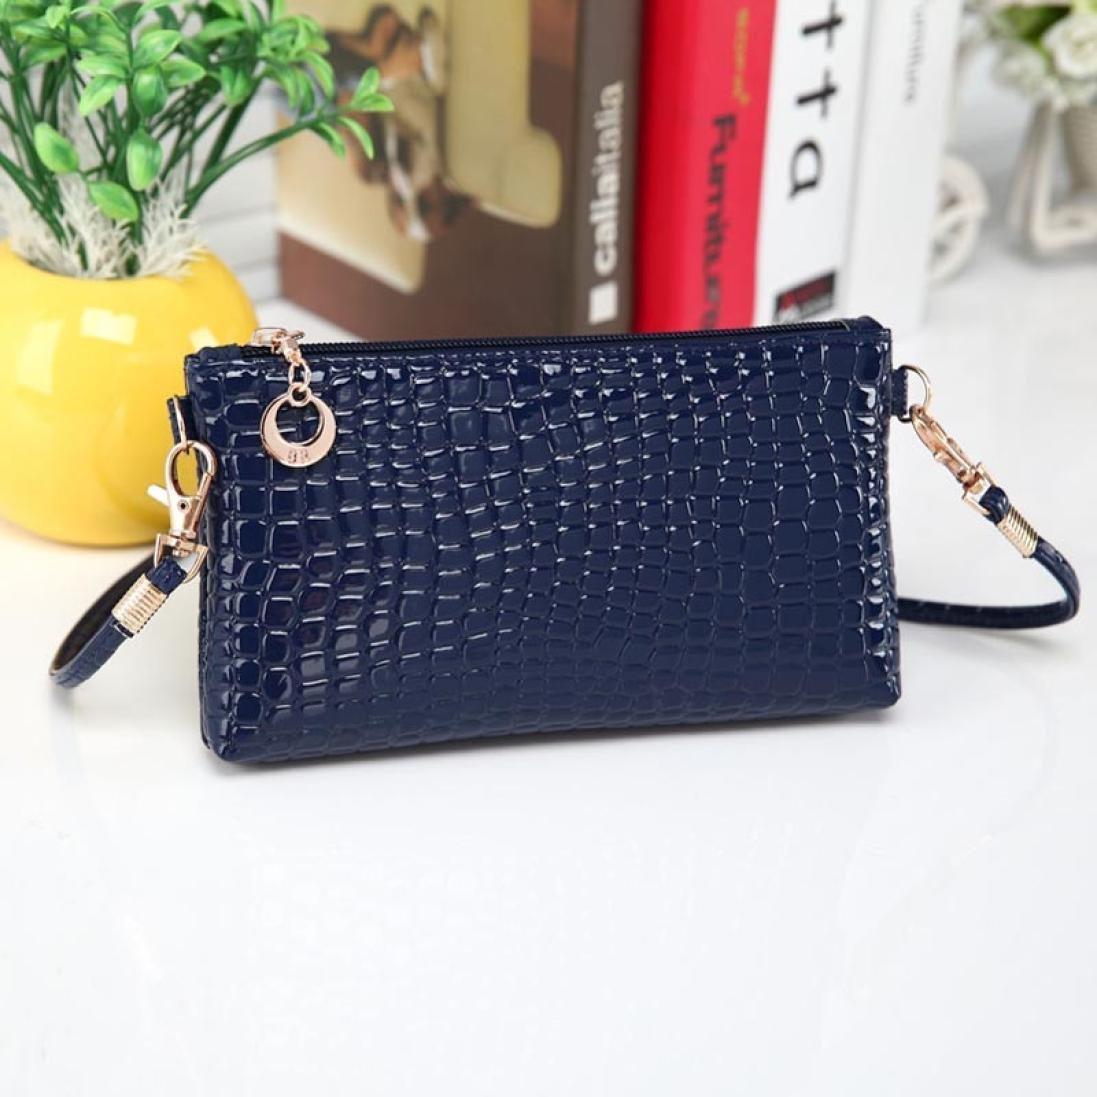 Gotd Bag Women Crocodile Leather Messenger Crossbody Clutch Shoulder Handbag (Blue)